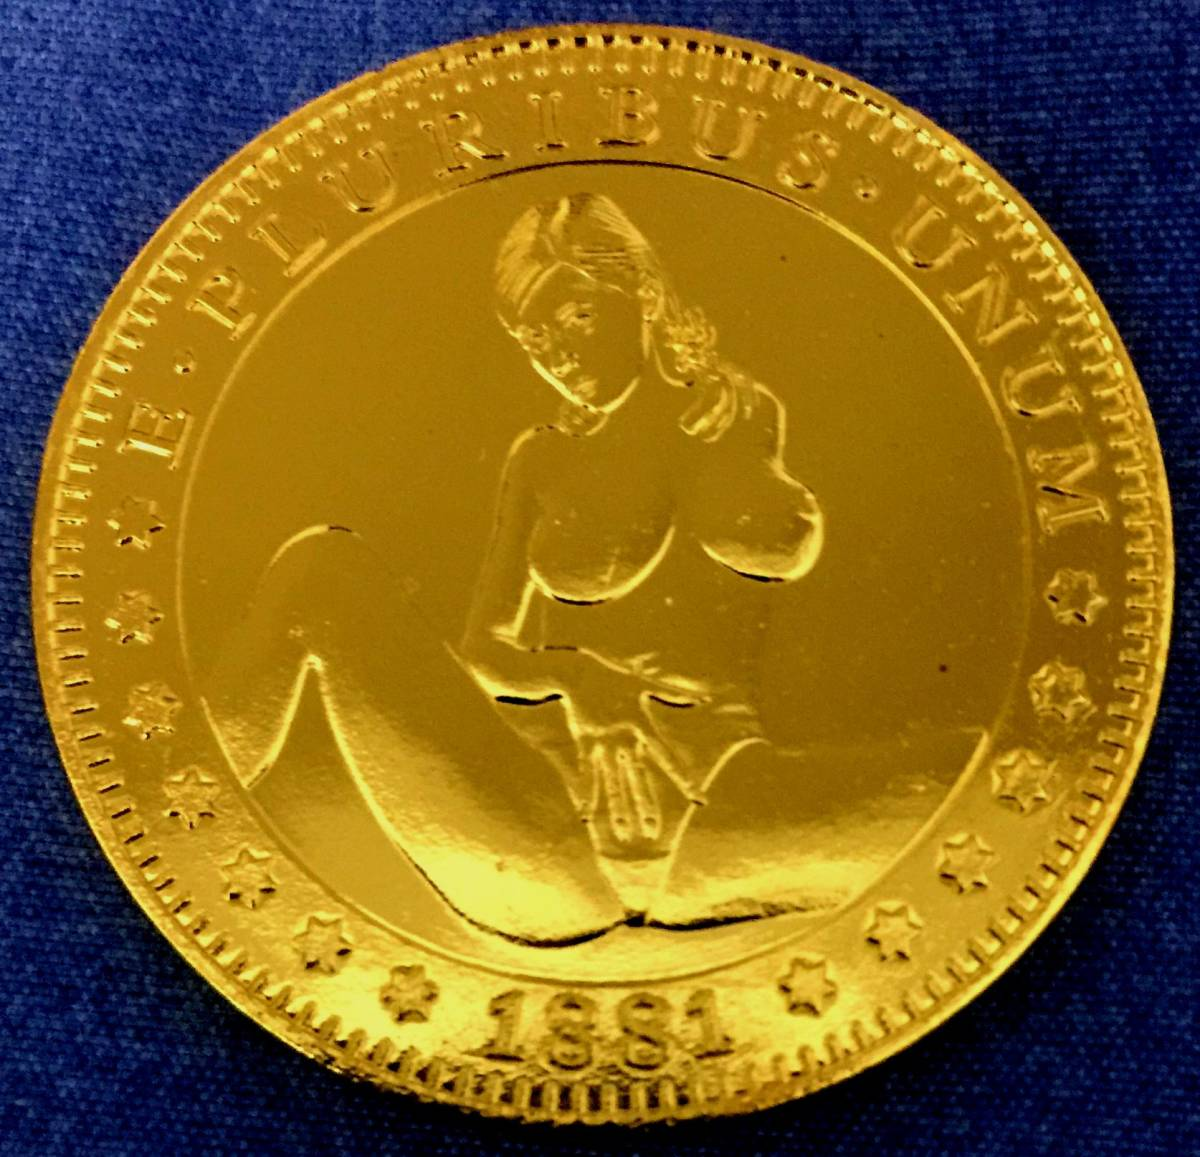 古銭貨幣貴重 希少珍品 極上品 アメリカ 古銭 金貨 稀少 1881年銘 38mm 20.9g